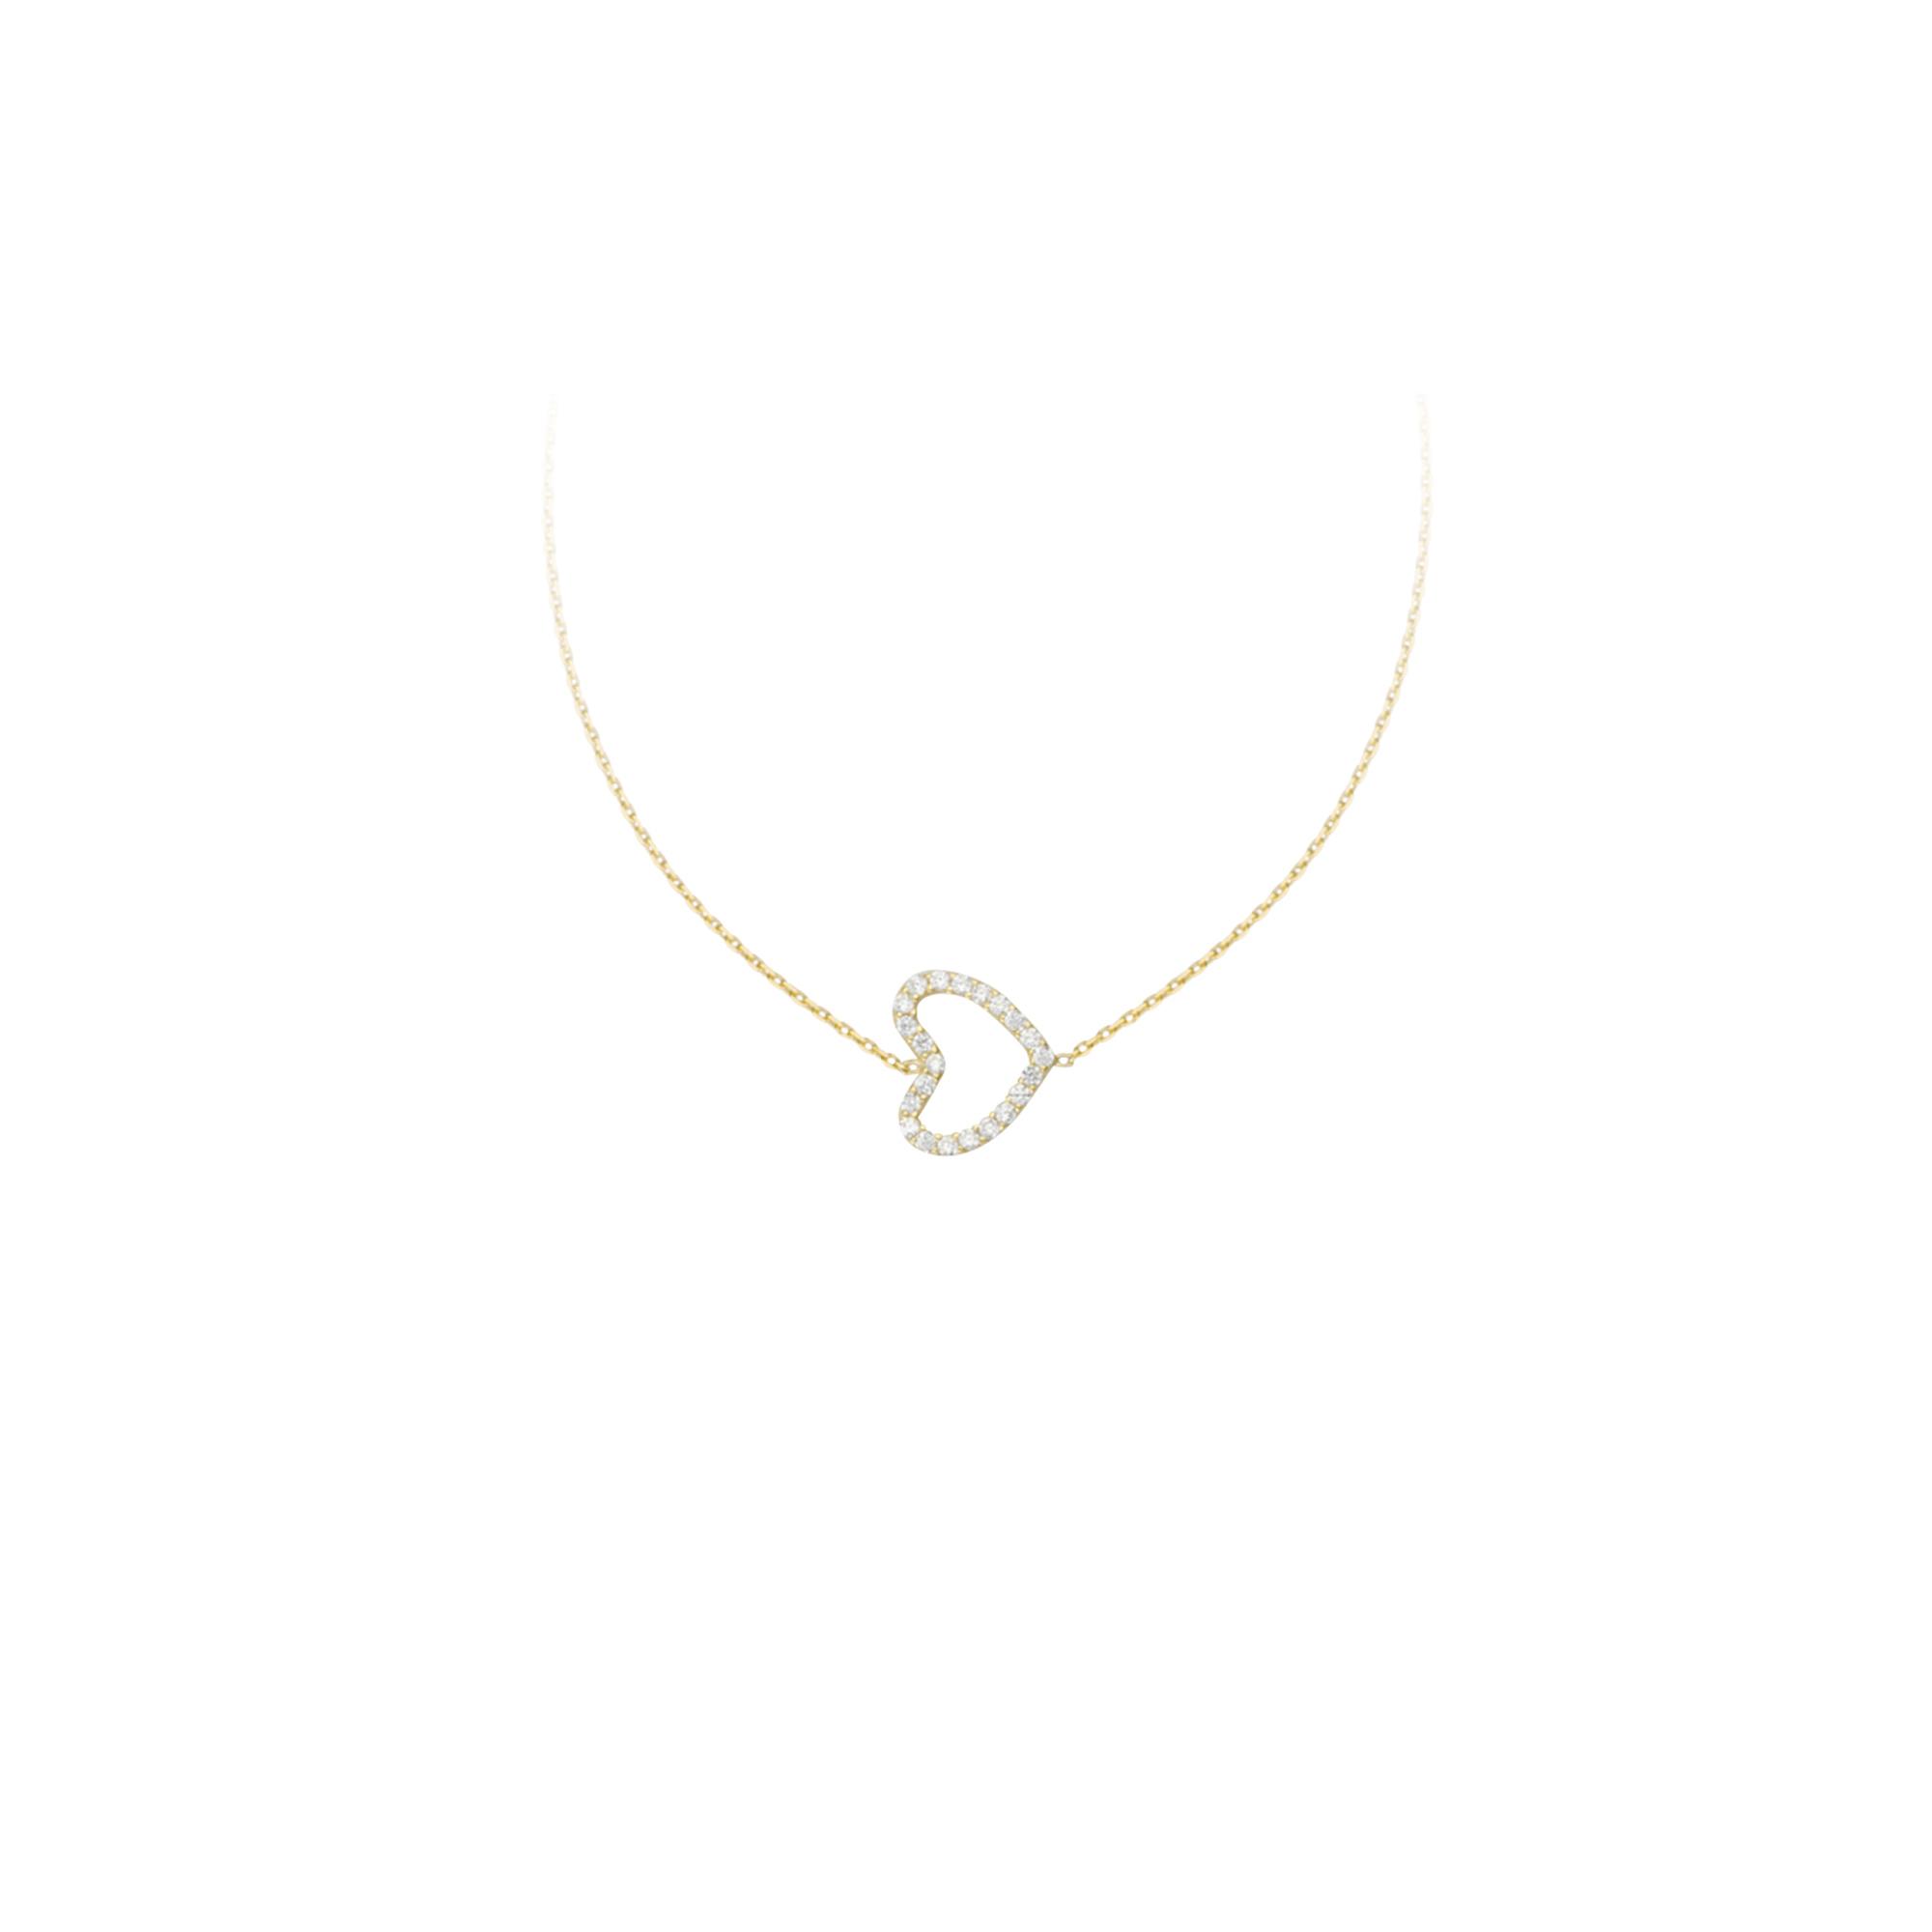 Heart Necklace, 14Kt Gold & Cz Heart Necklace 18